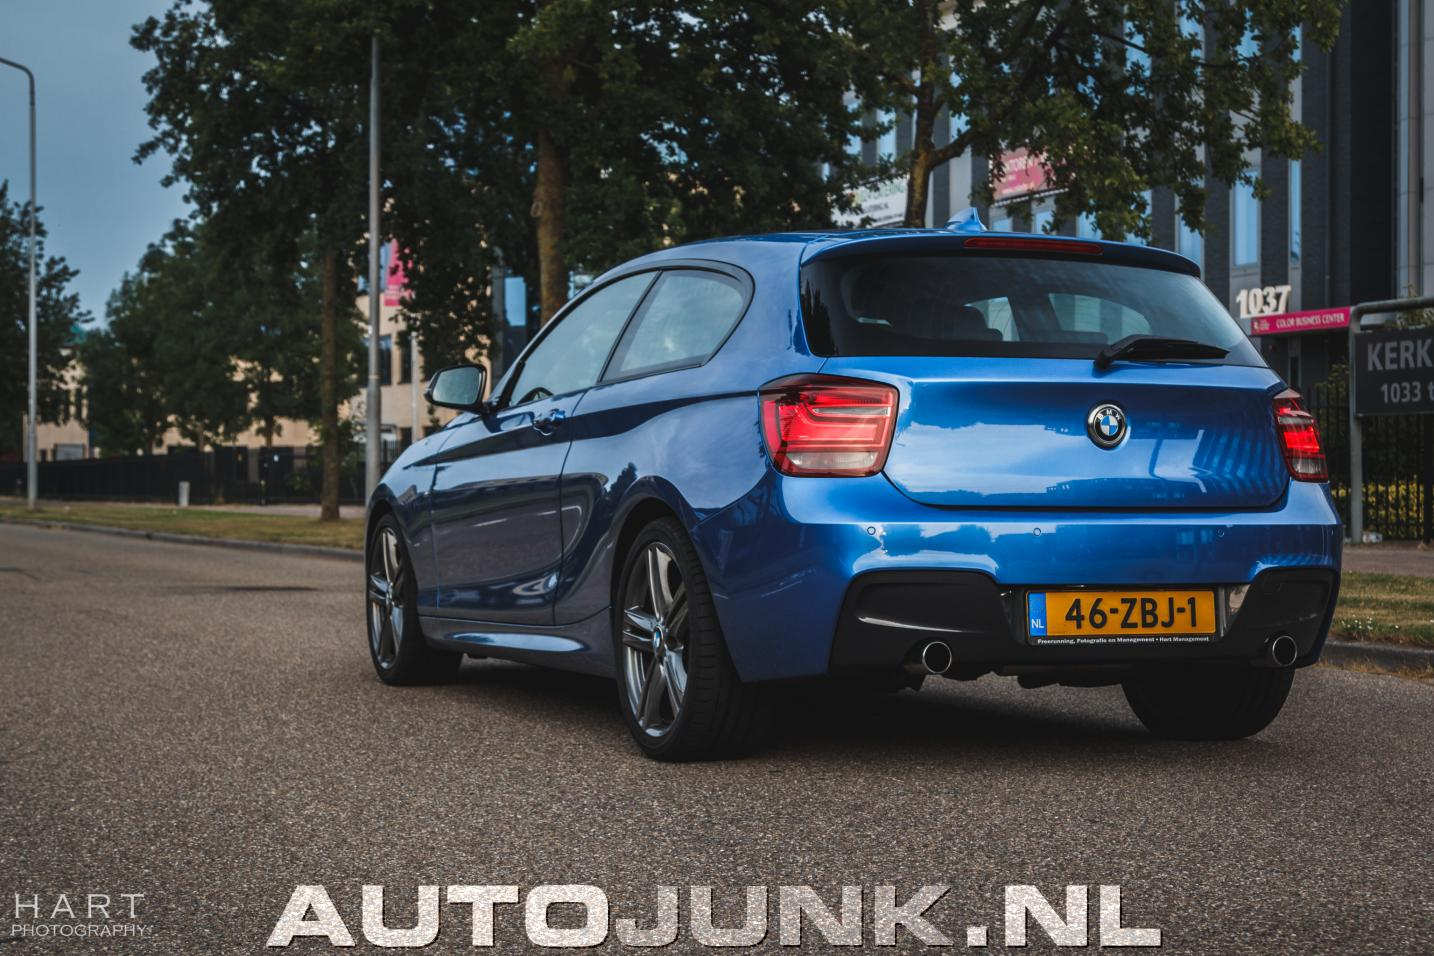 https://static.autojunk.nl/pictures/2015/0812/162933/bmw-1-serie-m-7_02.jpg